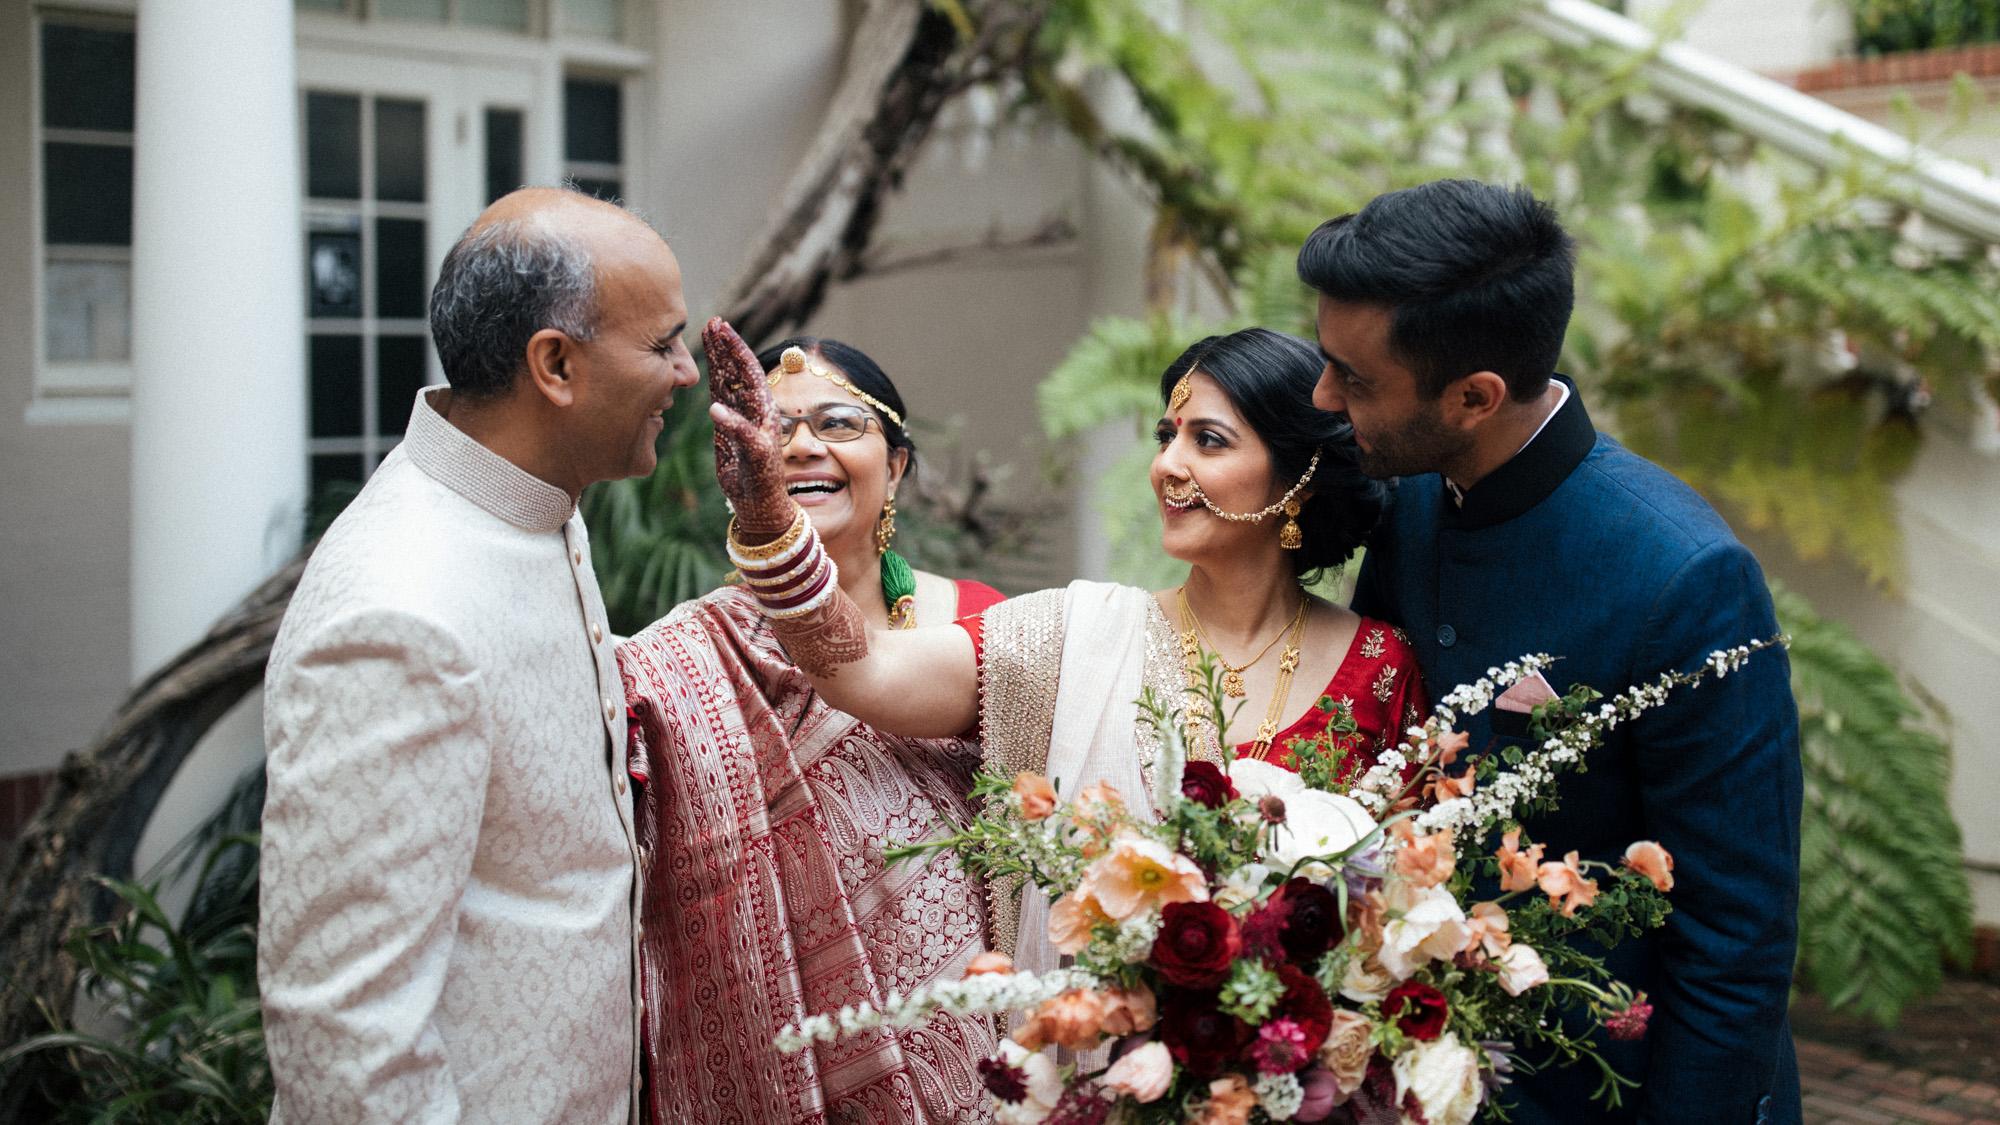 anu_maneesh_alec_vanderboom_Indian_wedding_photography-0060.jpg